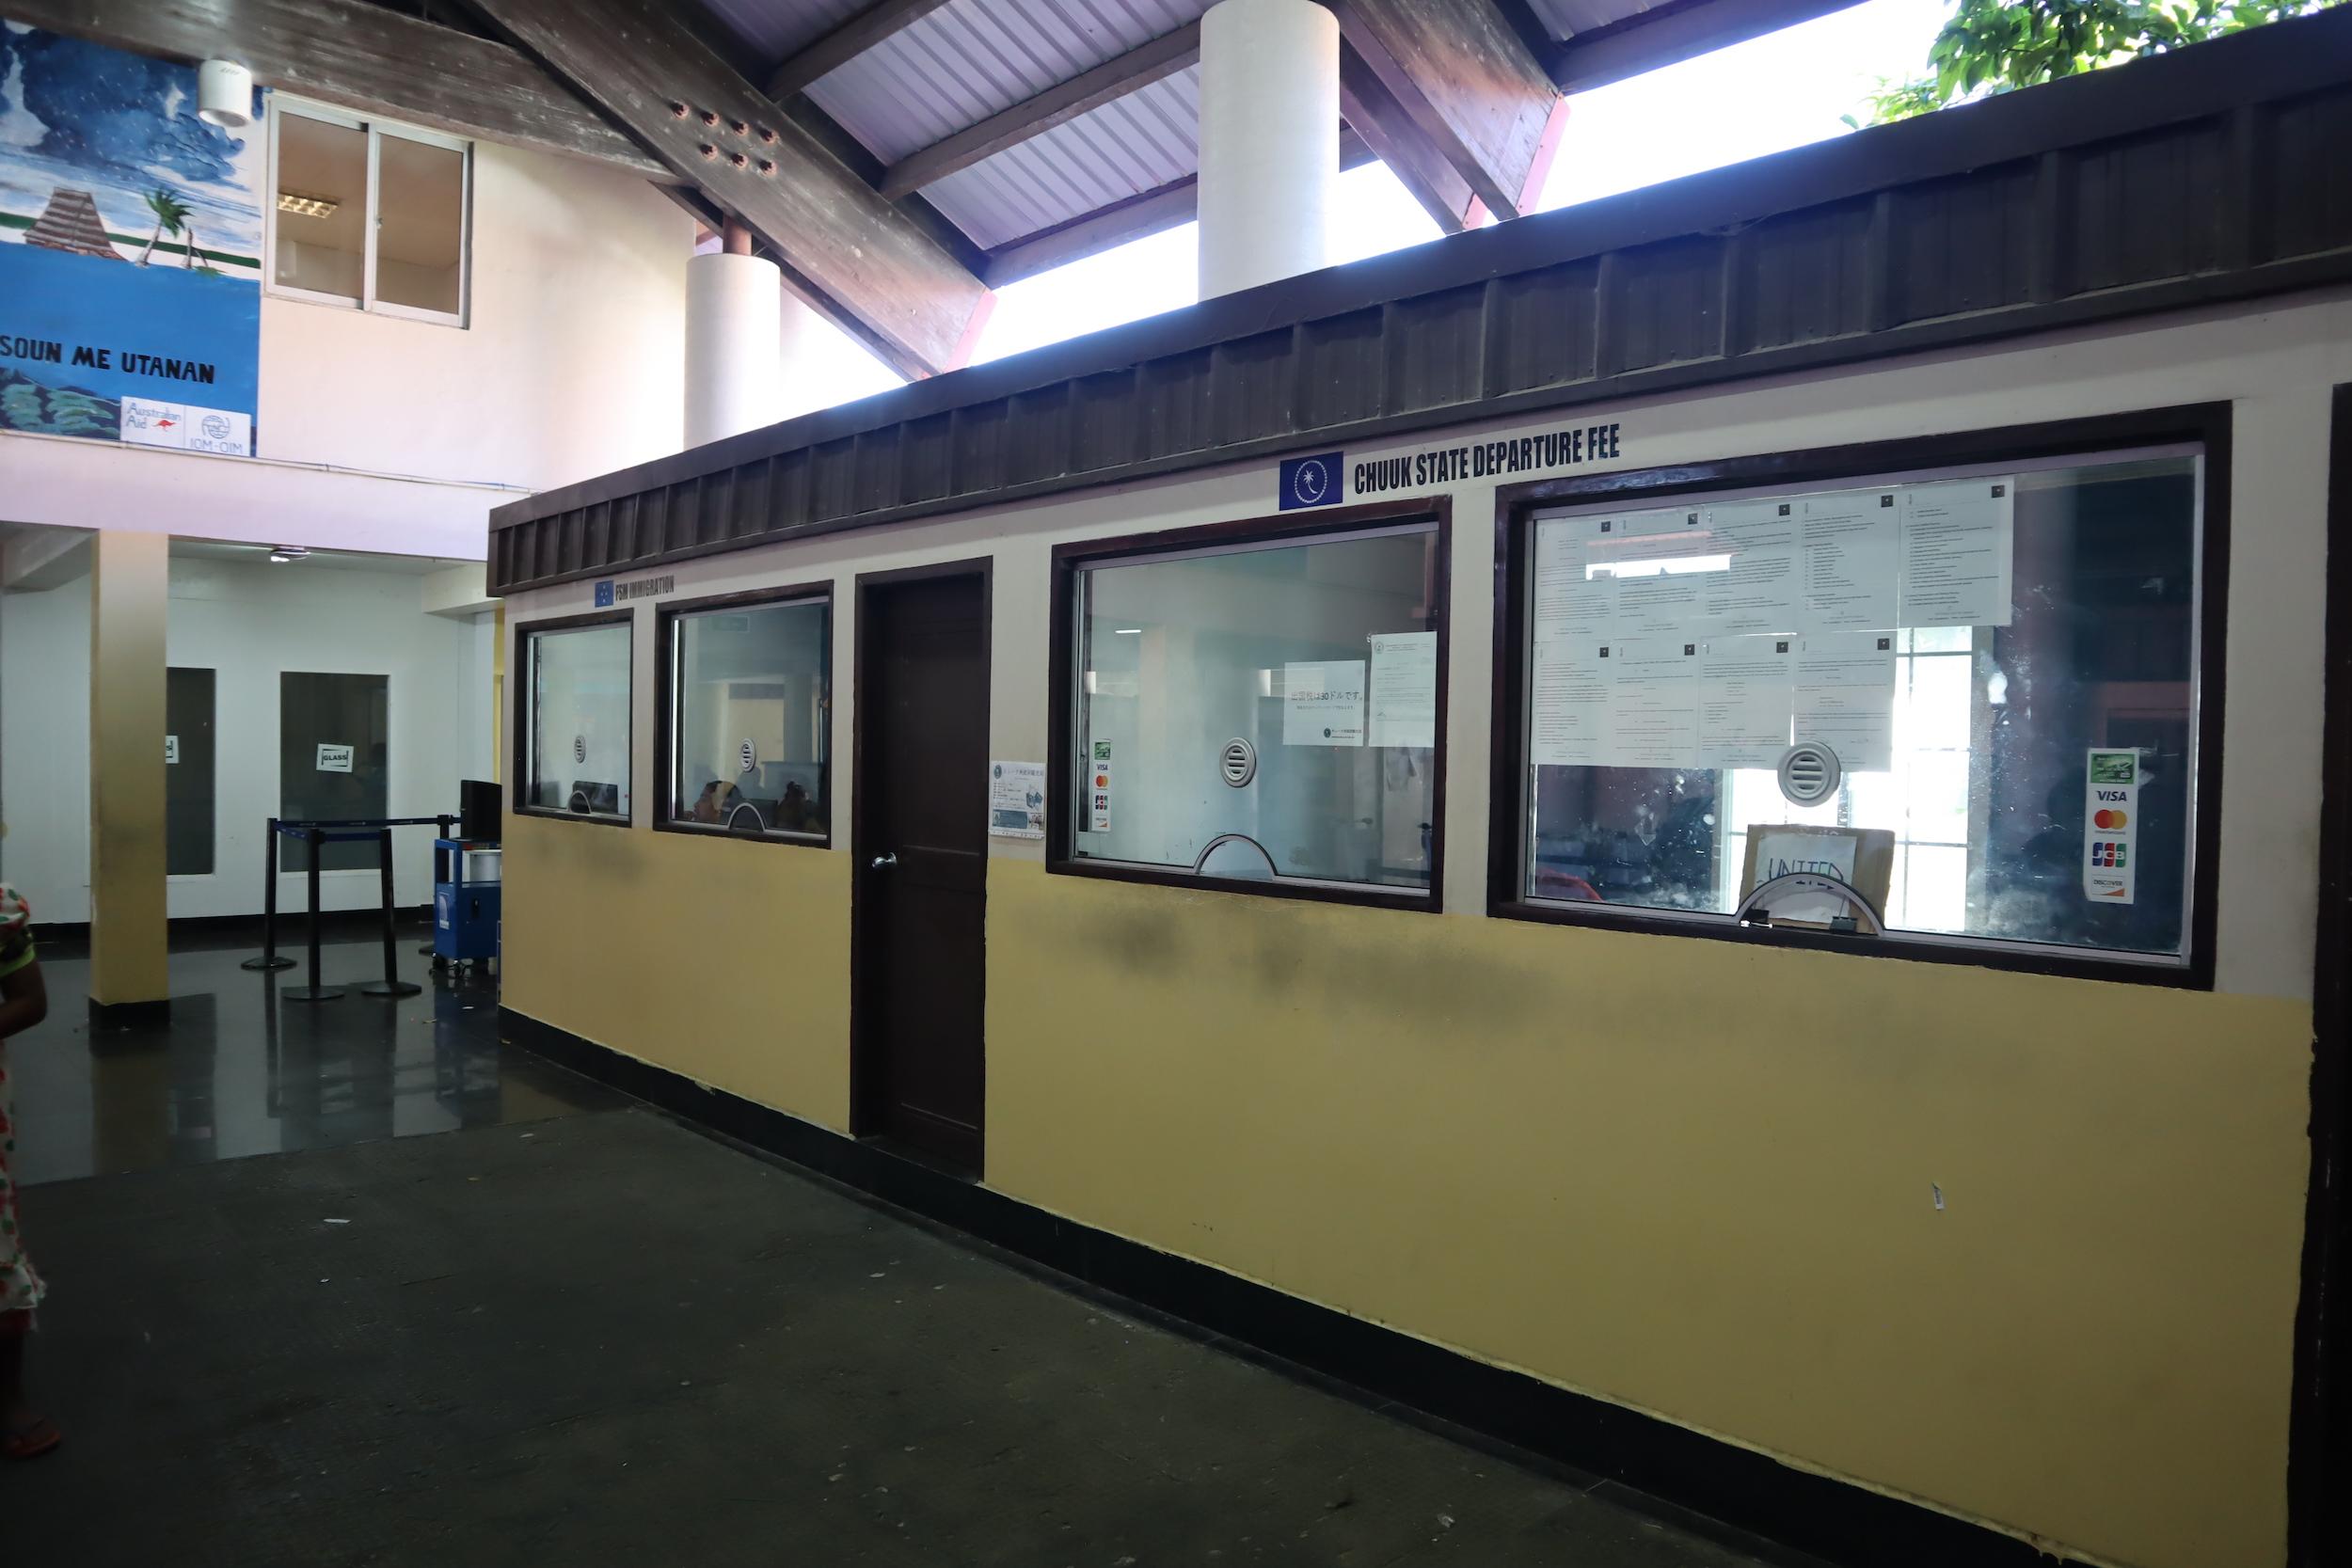 Chuuk International Airport – Departure fee desk